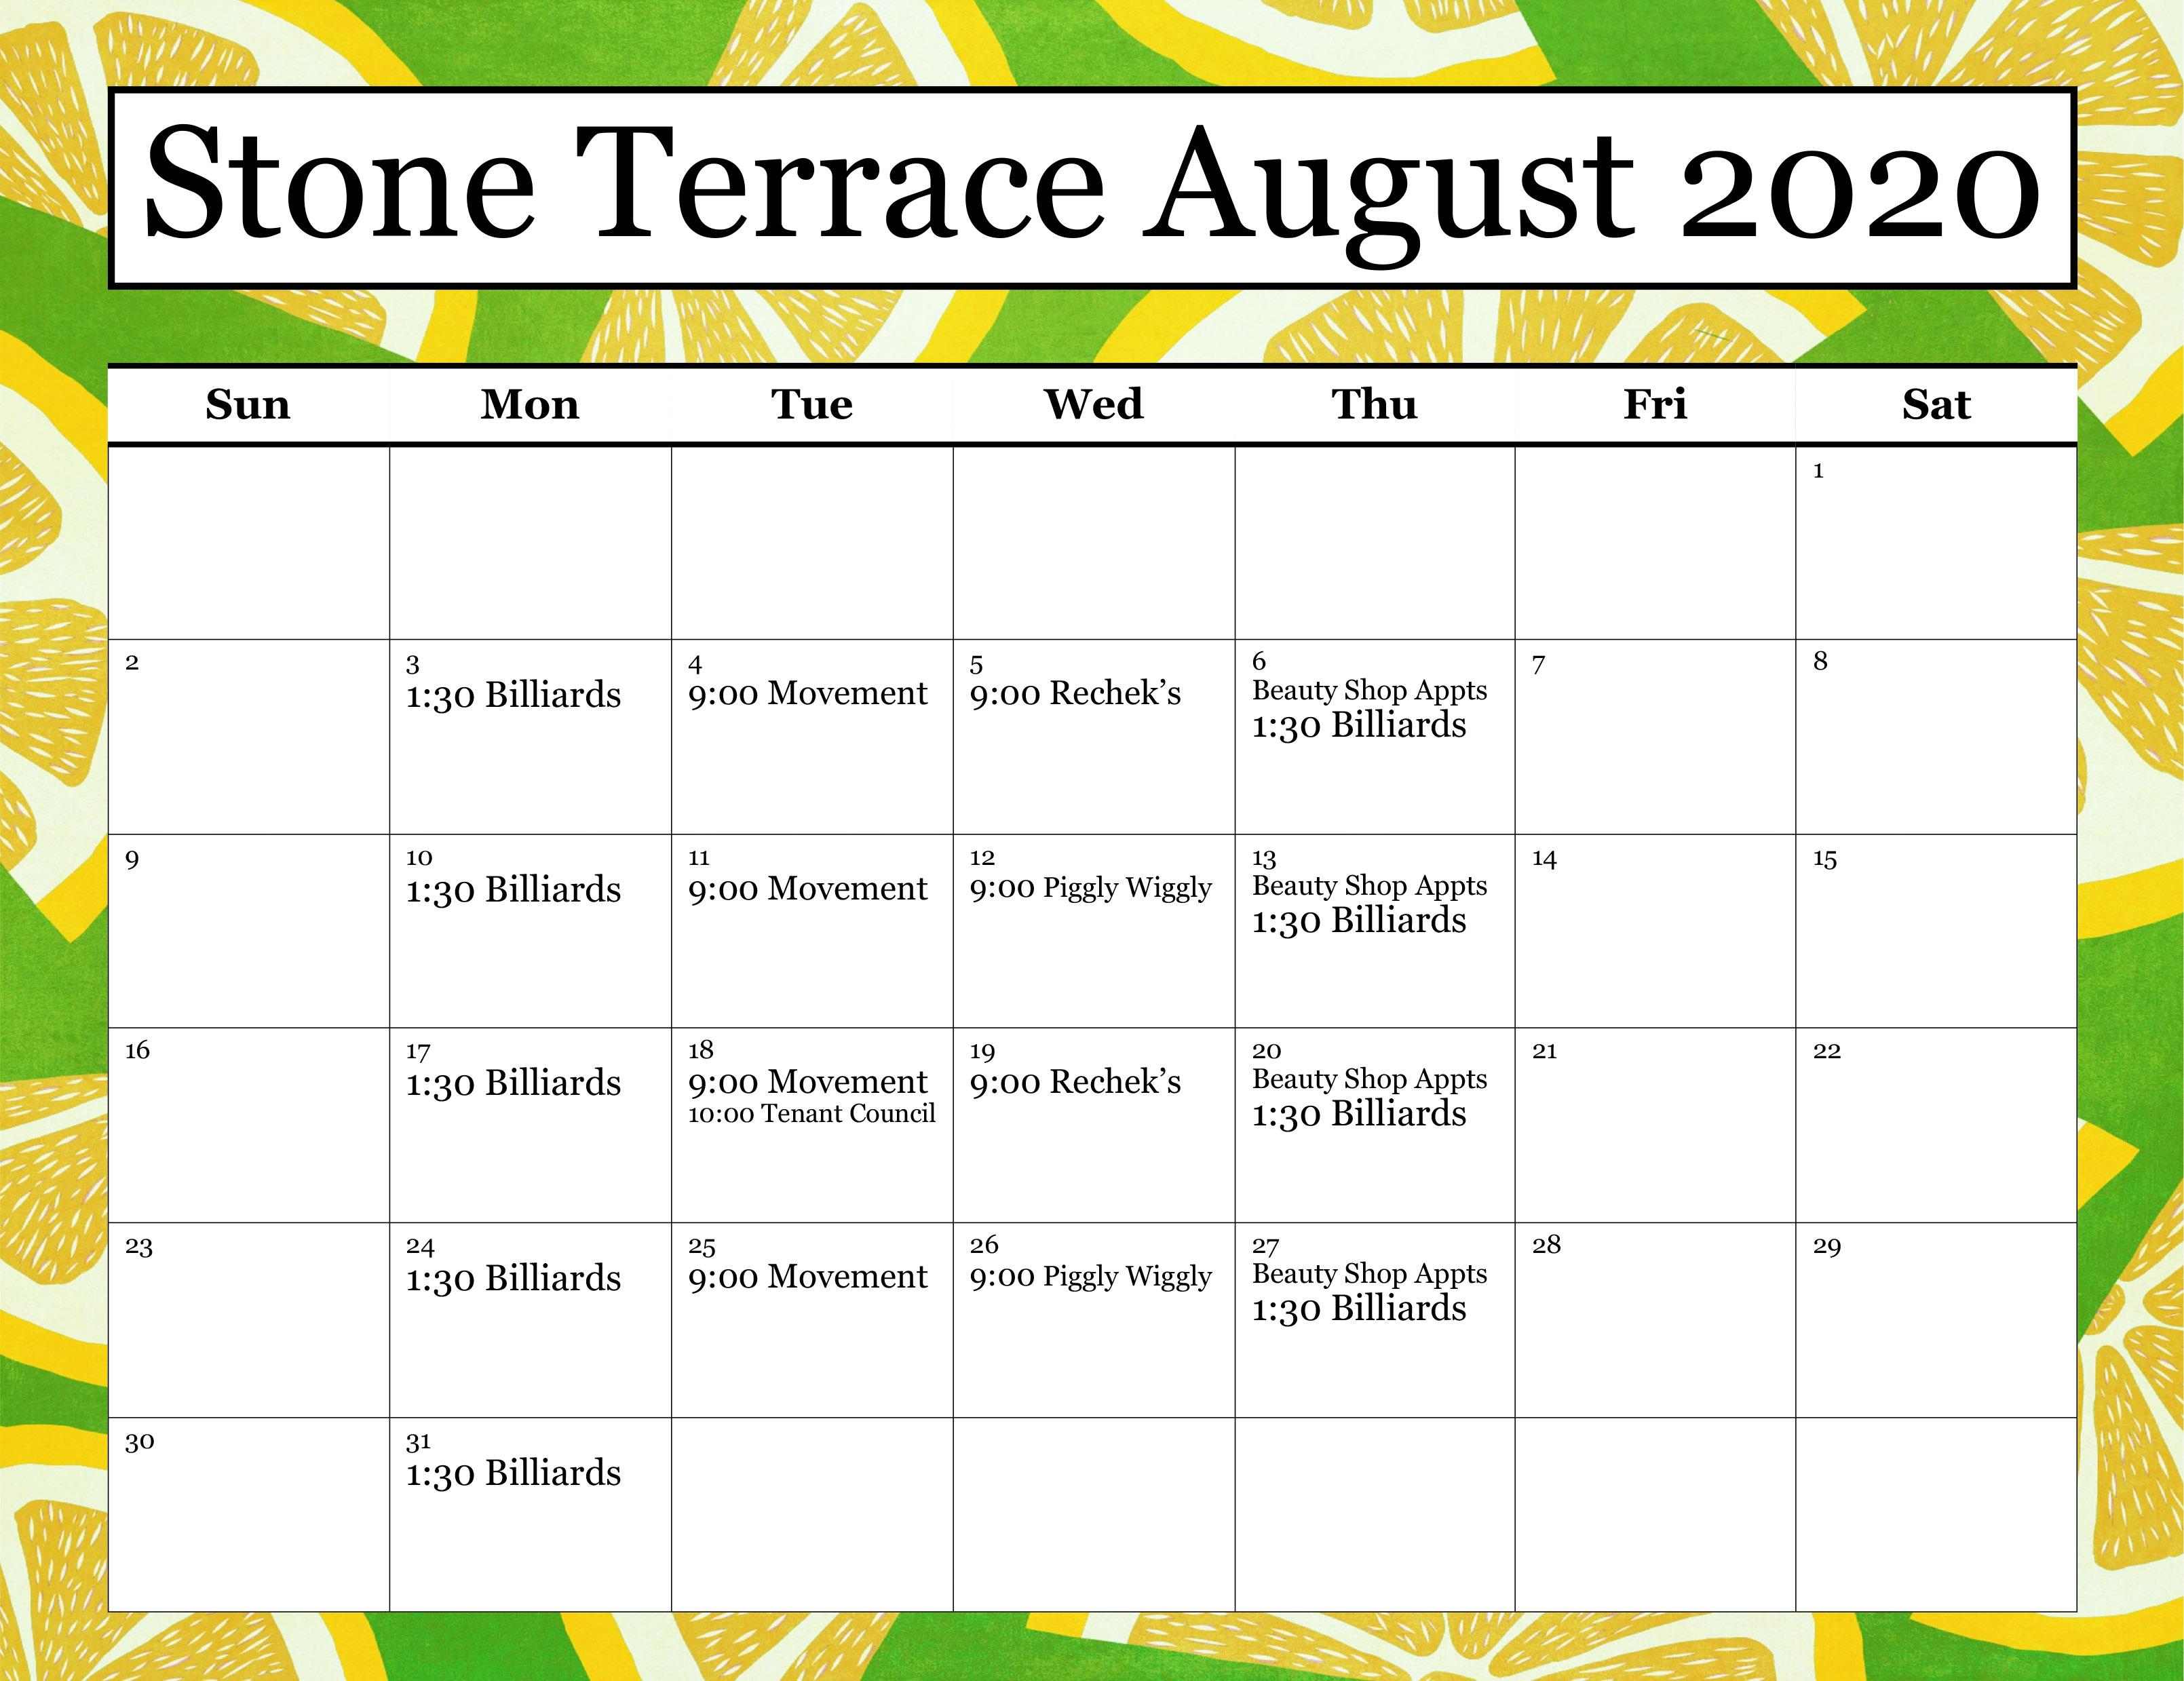 https://bdch.com/sites/bdch.com/assets/images/Calendars/August-2020.jpg